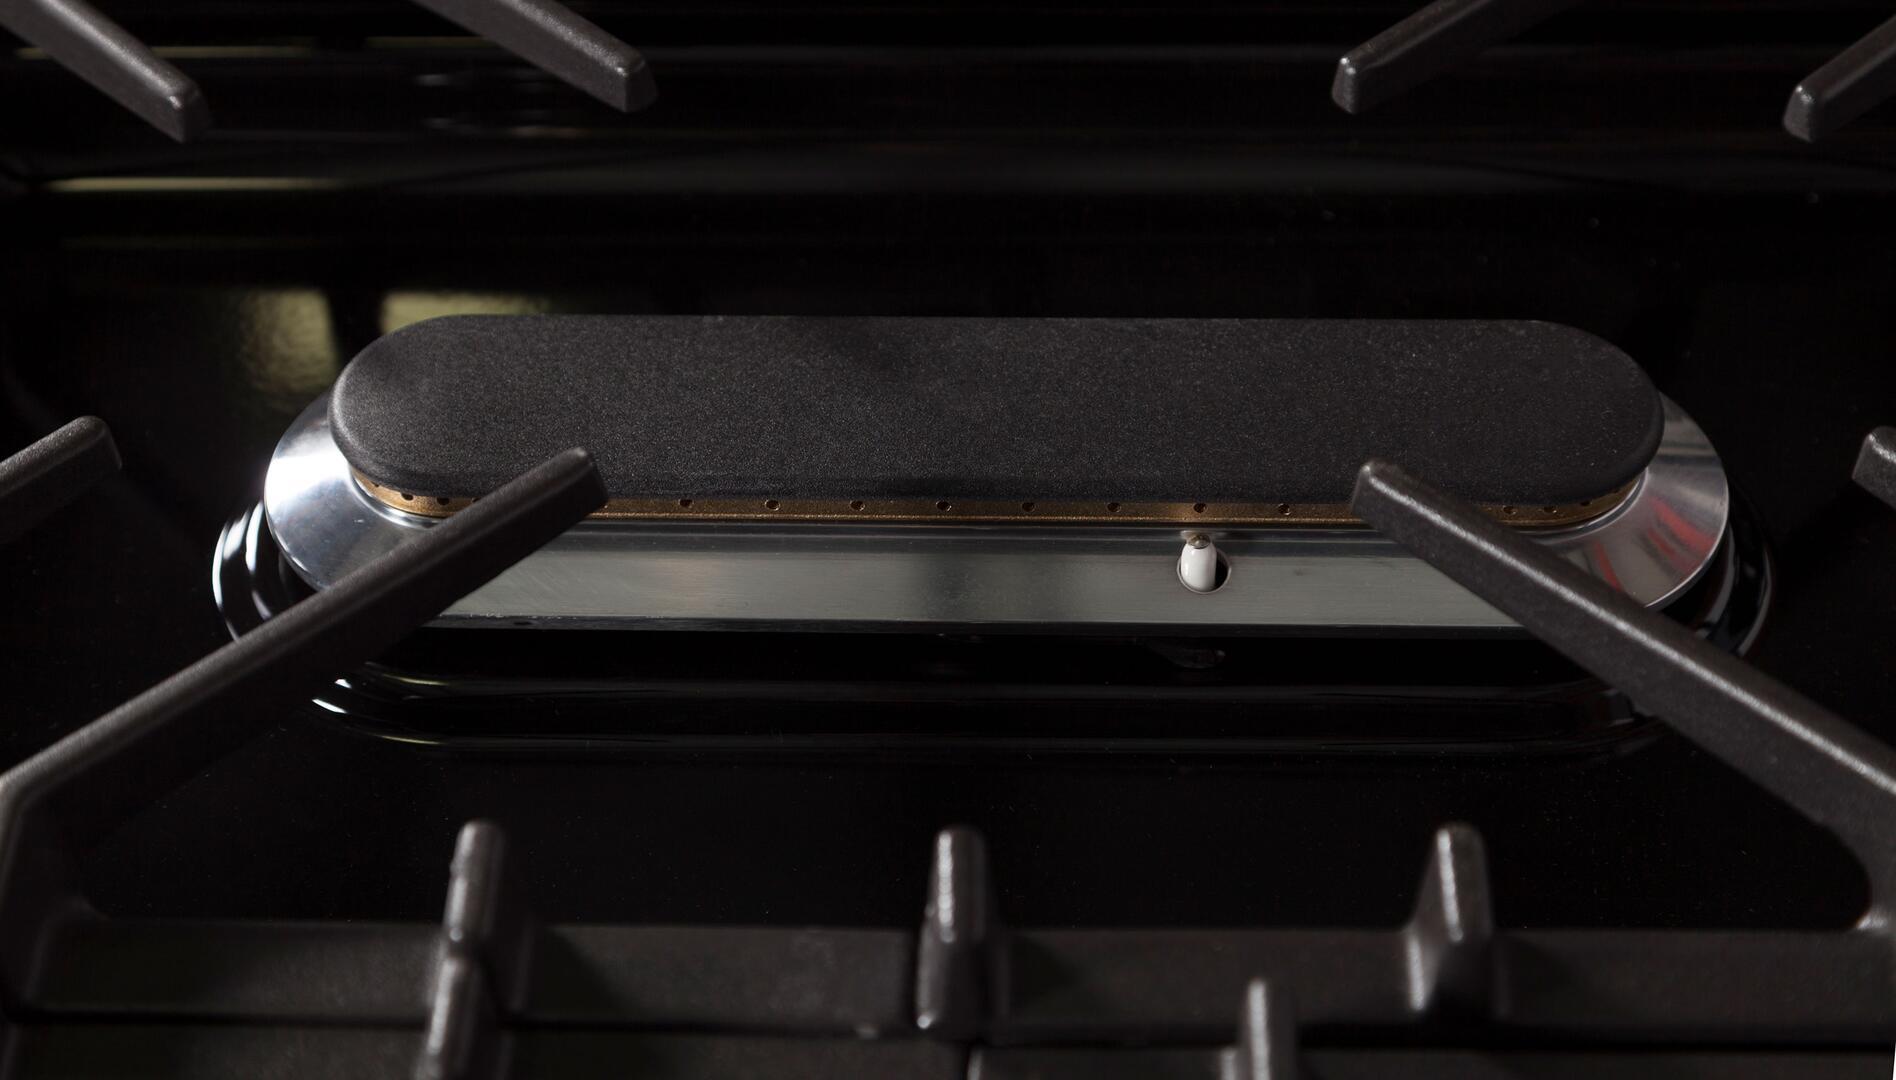 Ilve Professional Plus UPW90FDMPI Freestanding Dual Fuel Range Stainless Steel, Oval Burner